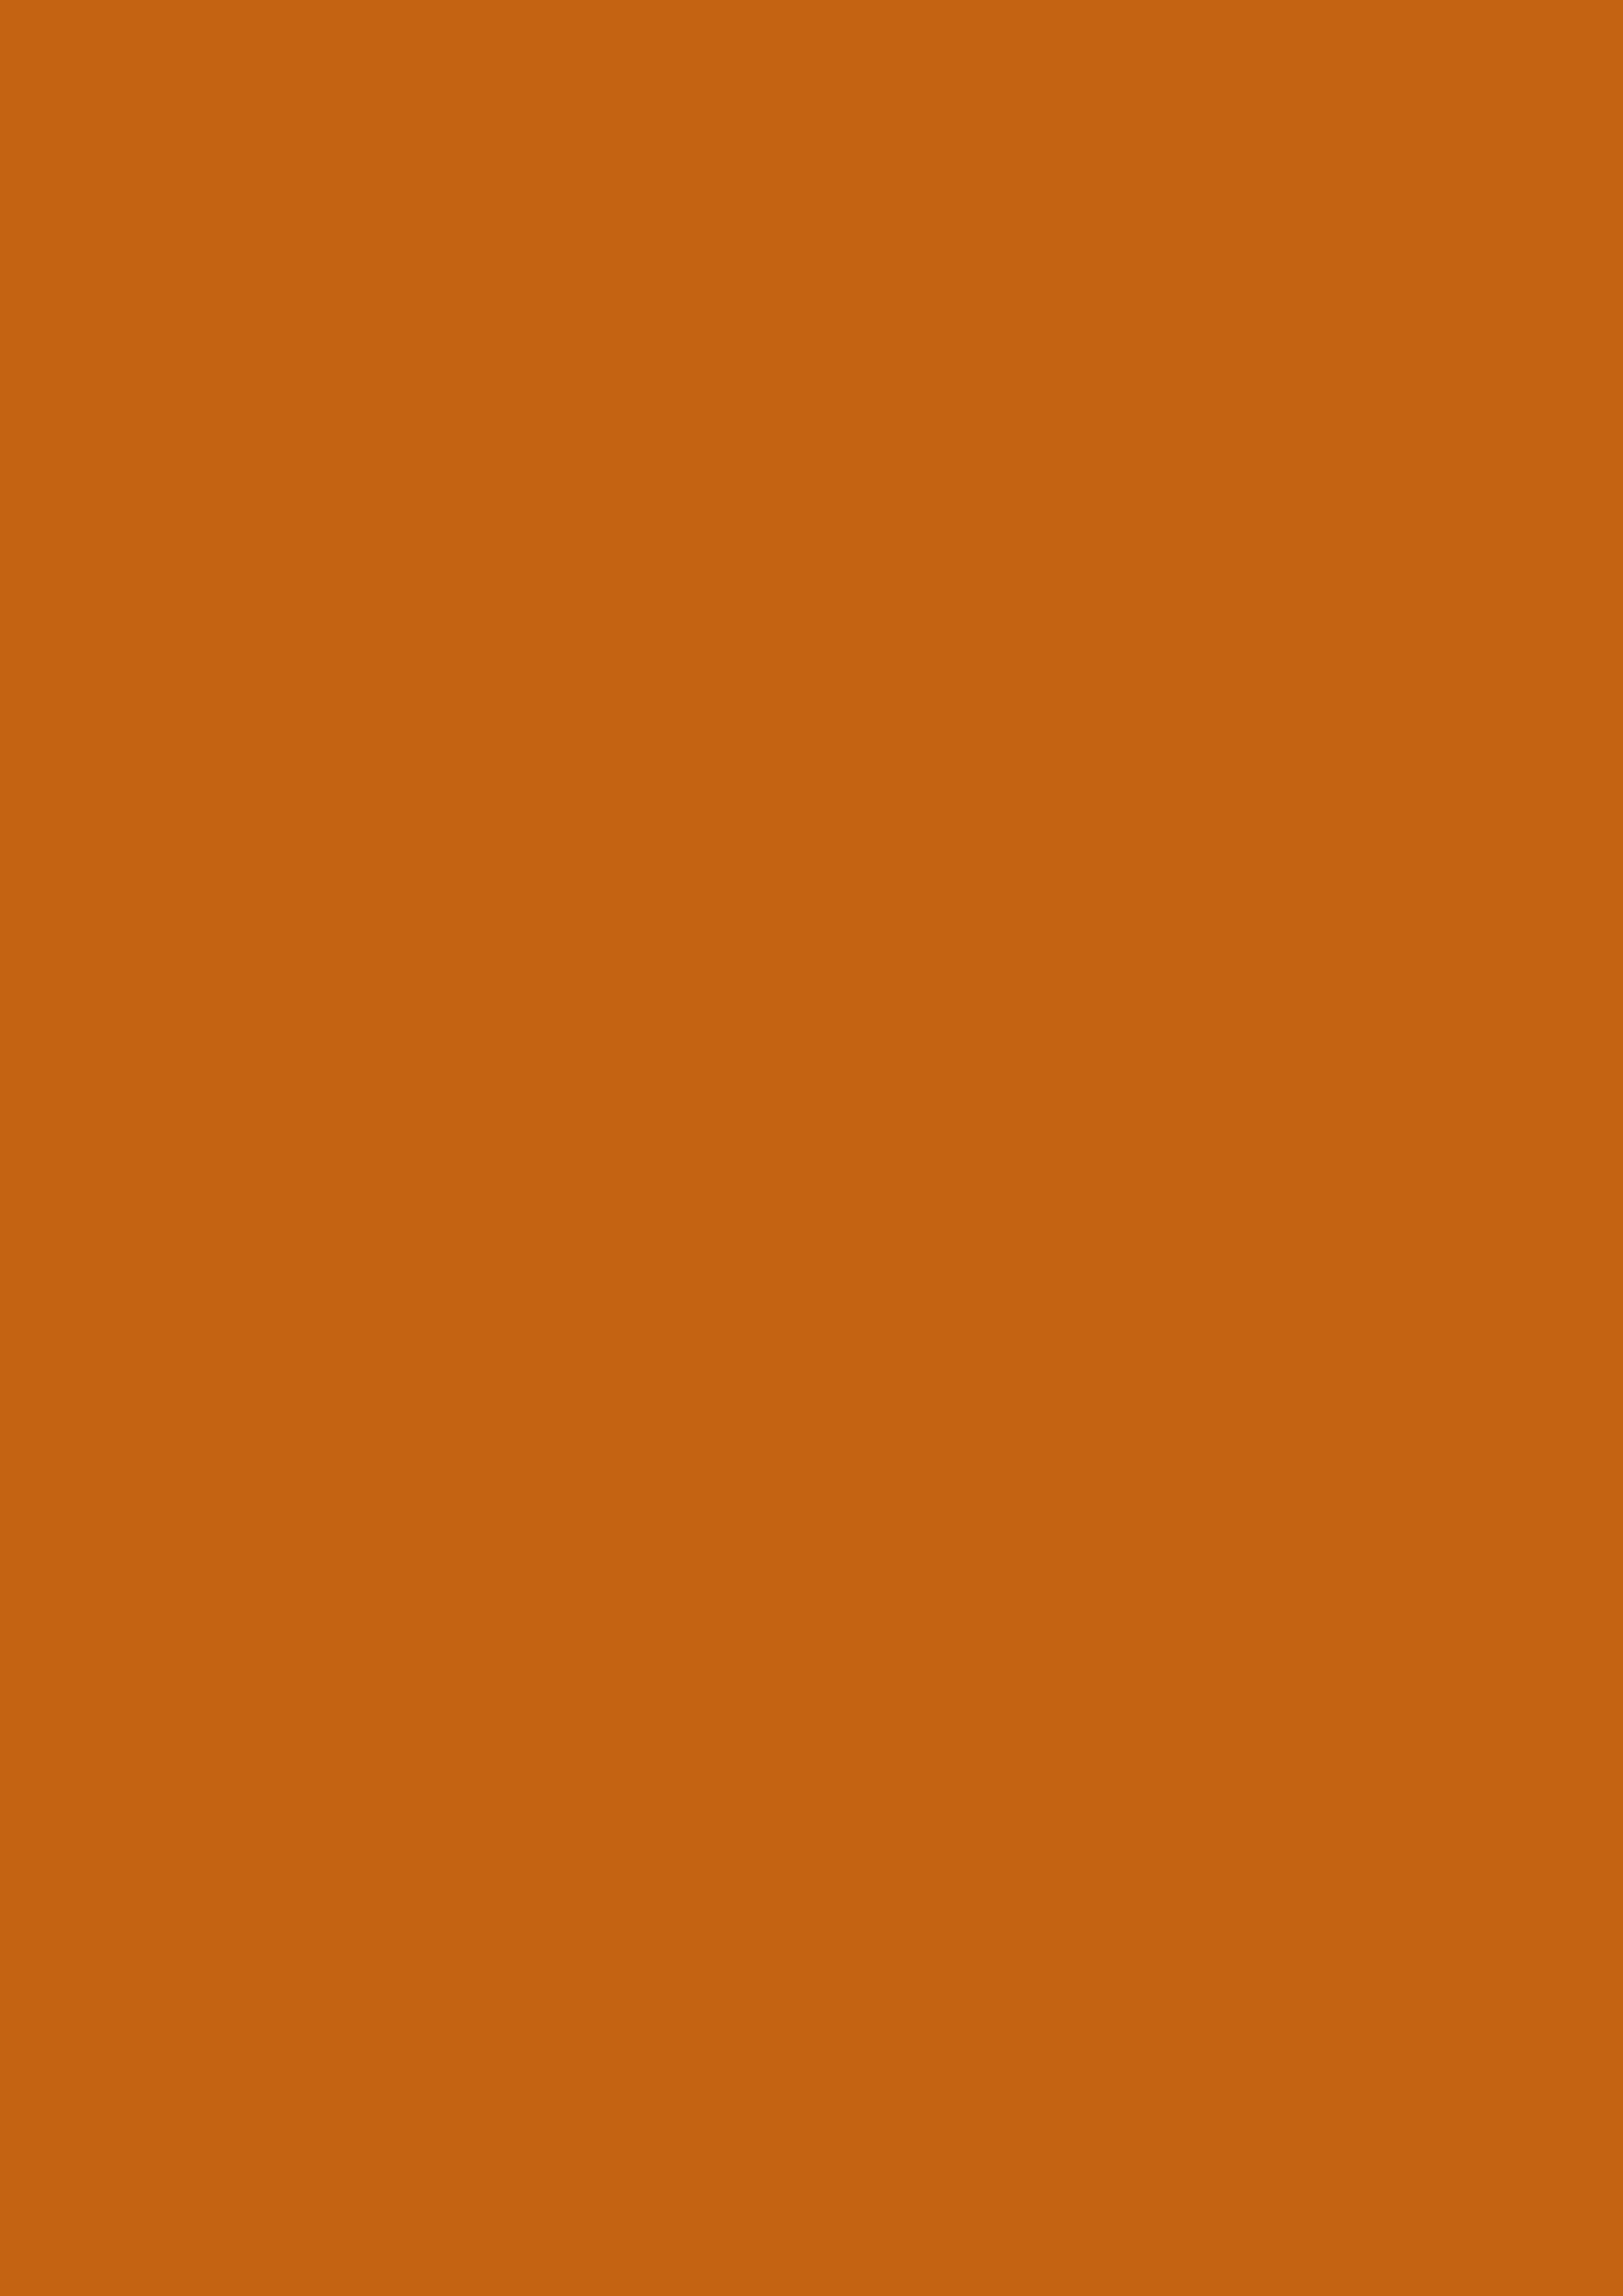 2480x3508 Alloy Orange Solid Color Background